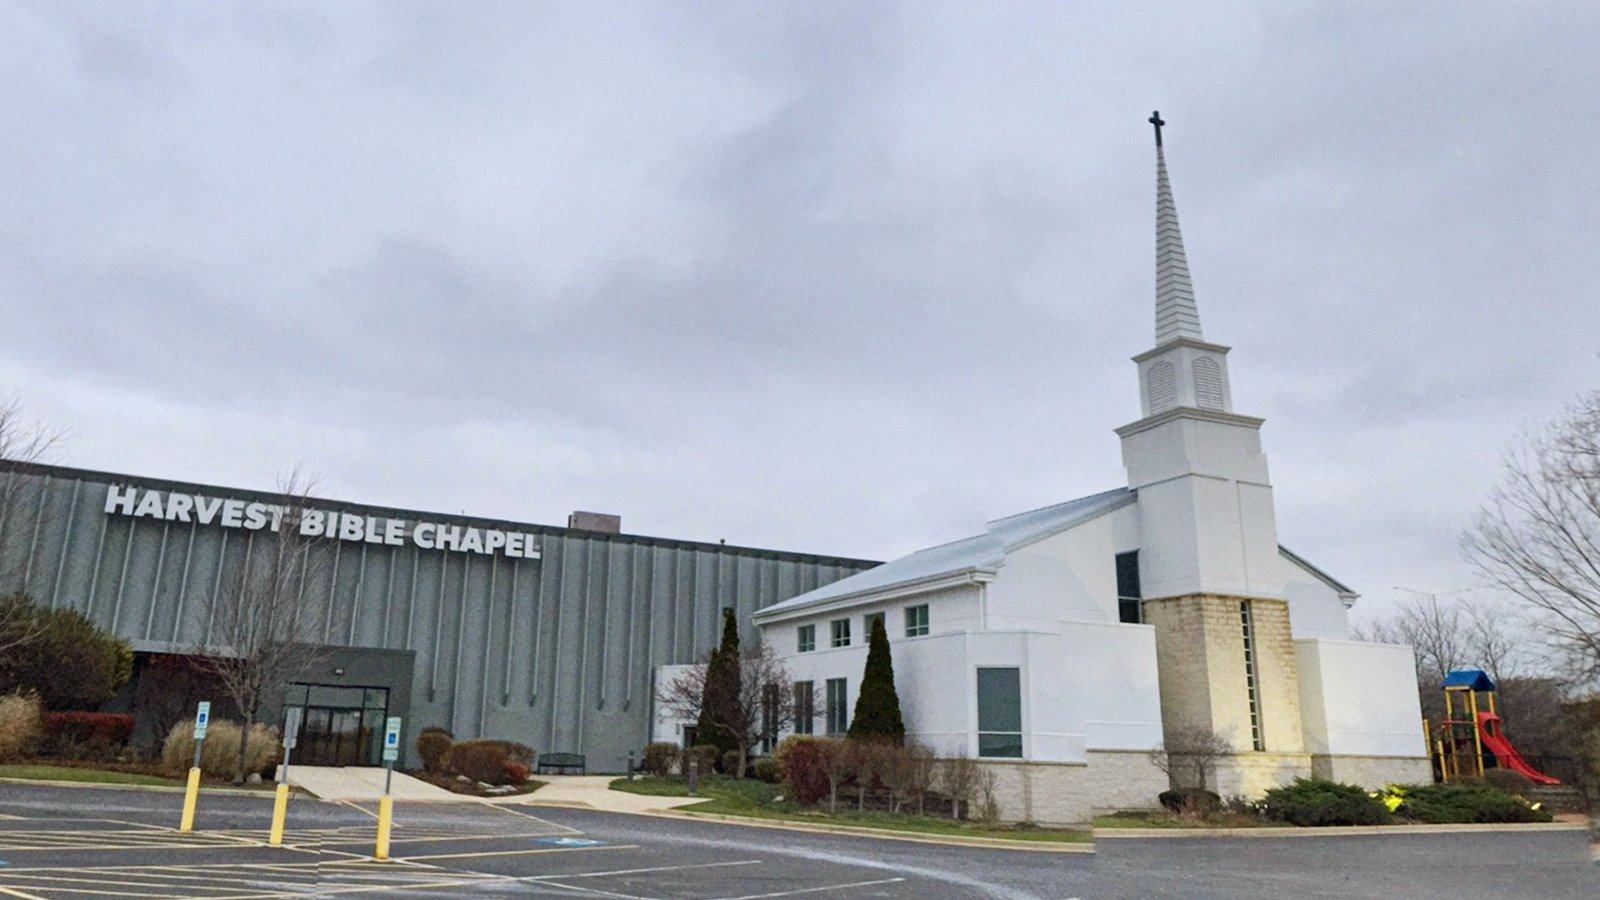 ECFA suspends Chicago-area megachurch Harvest Bible Chapel